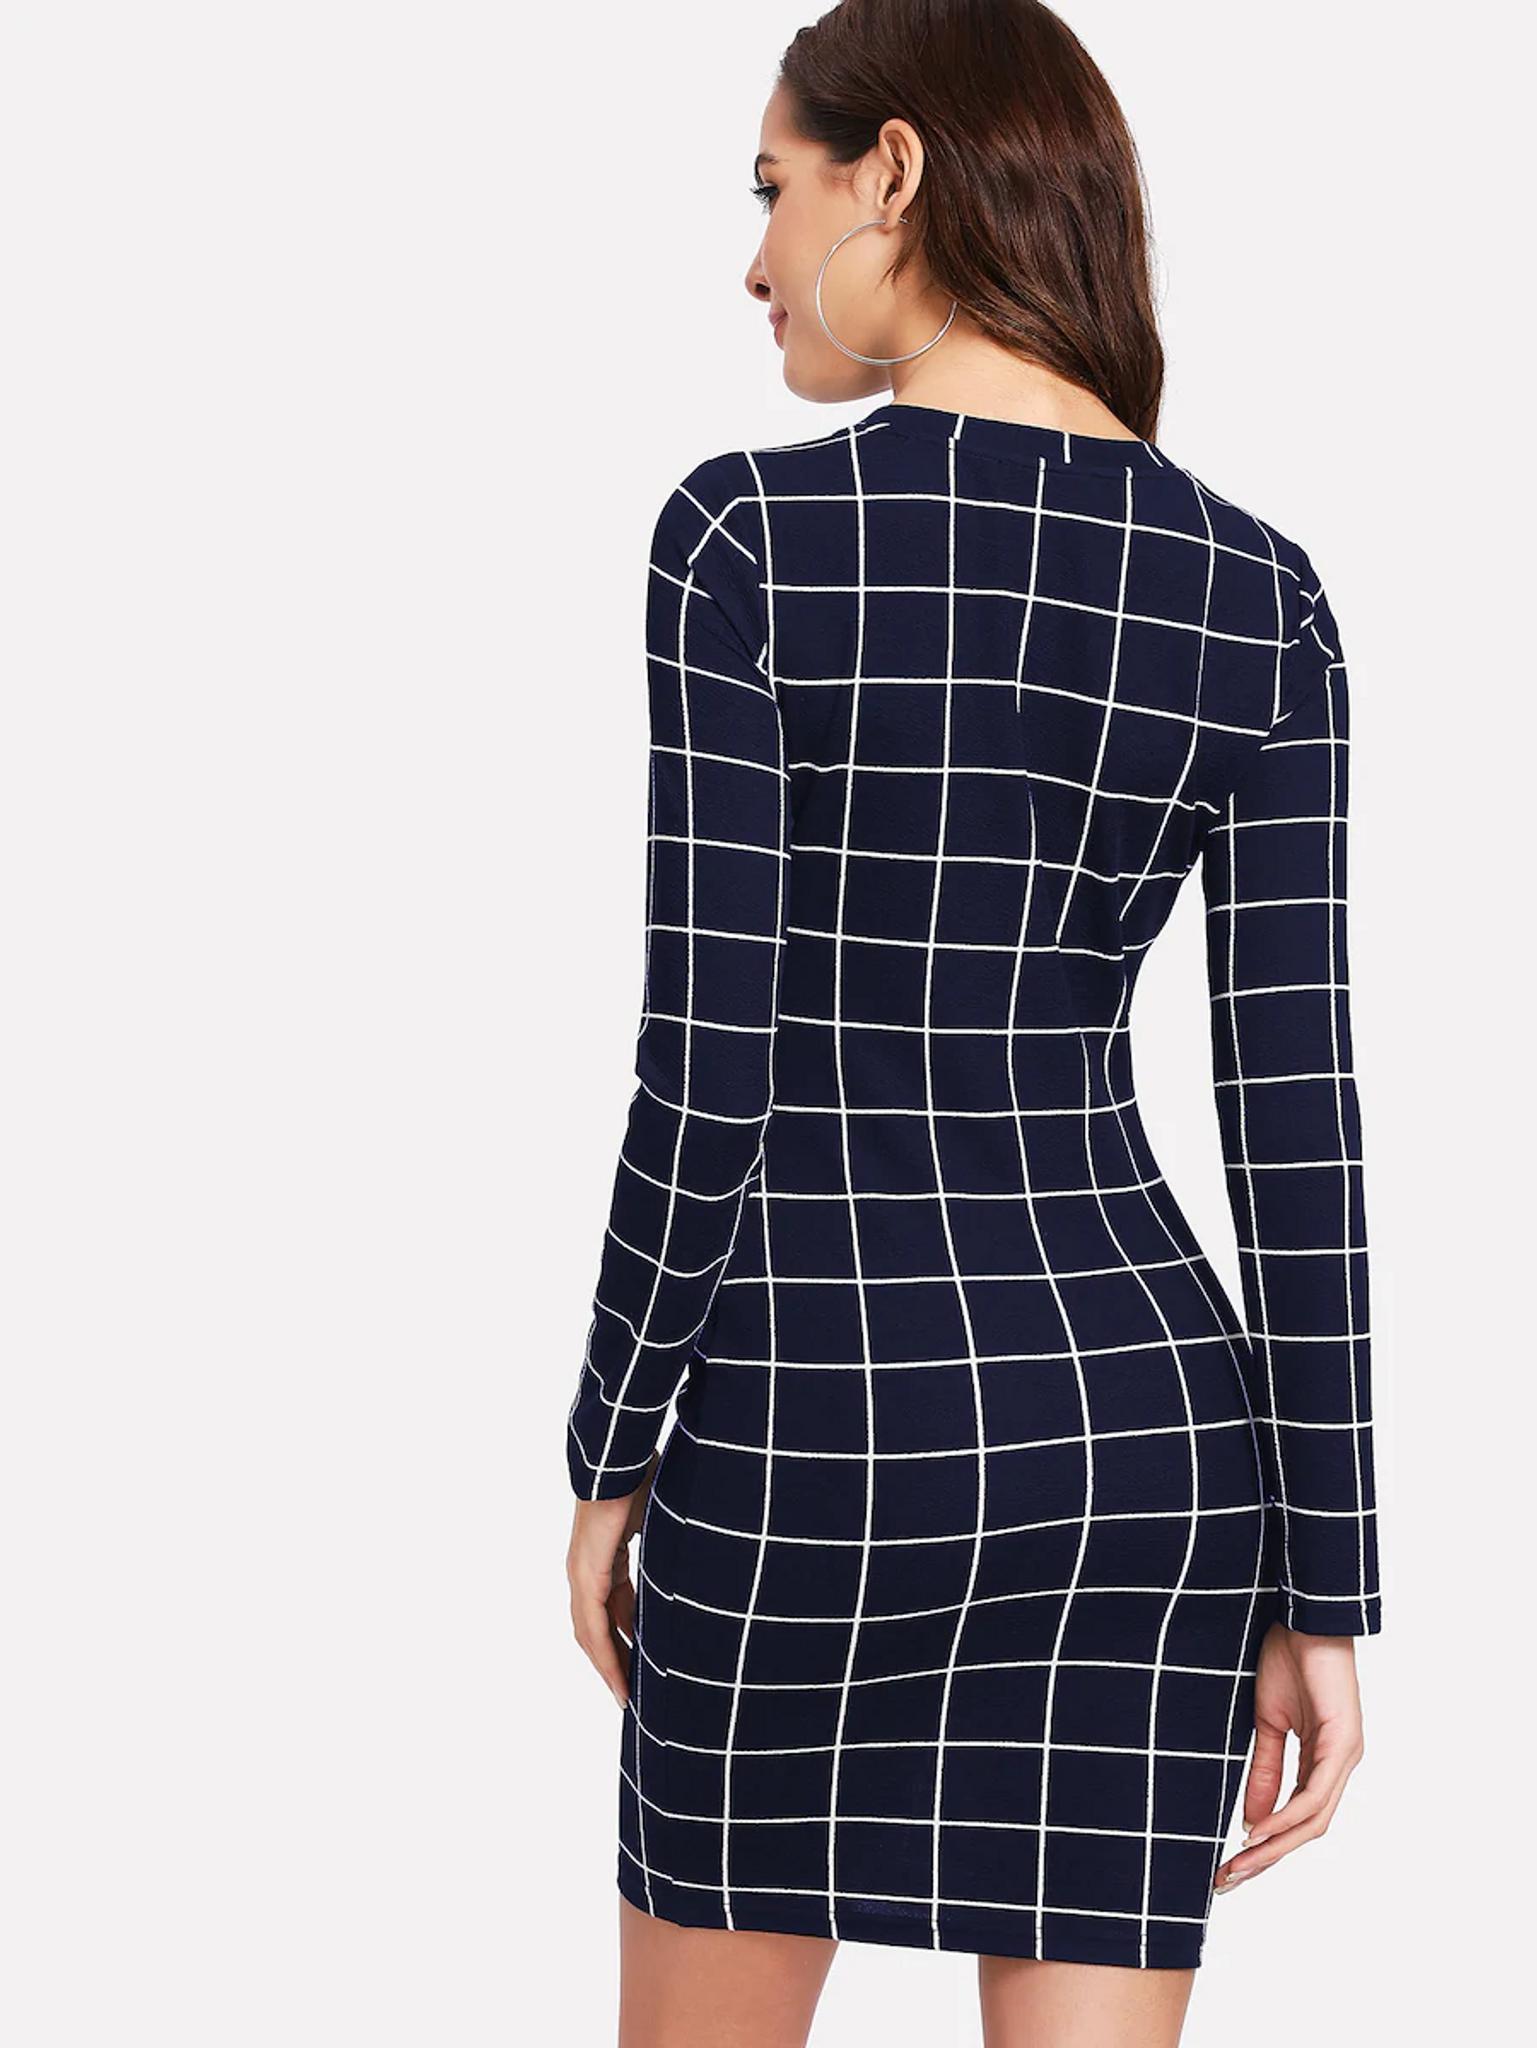 Fifth Avenue Women's Grid Print UVA159 Tunic Dress - Navy Blue